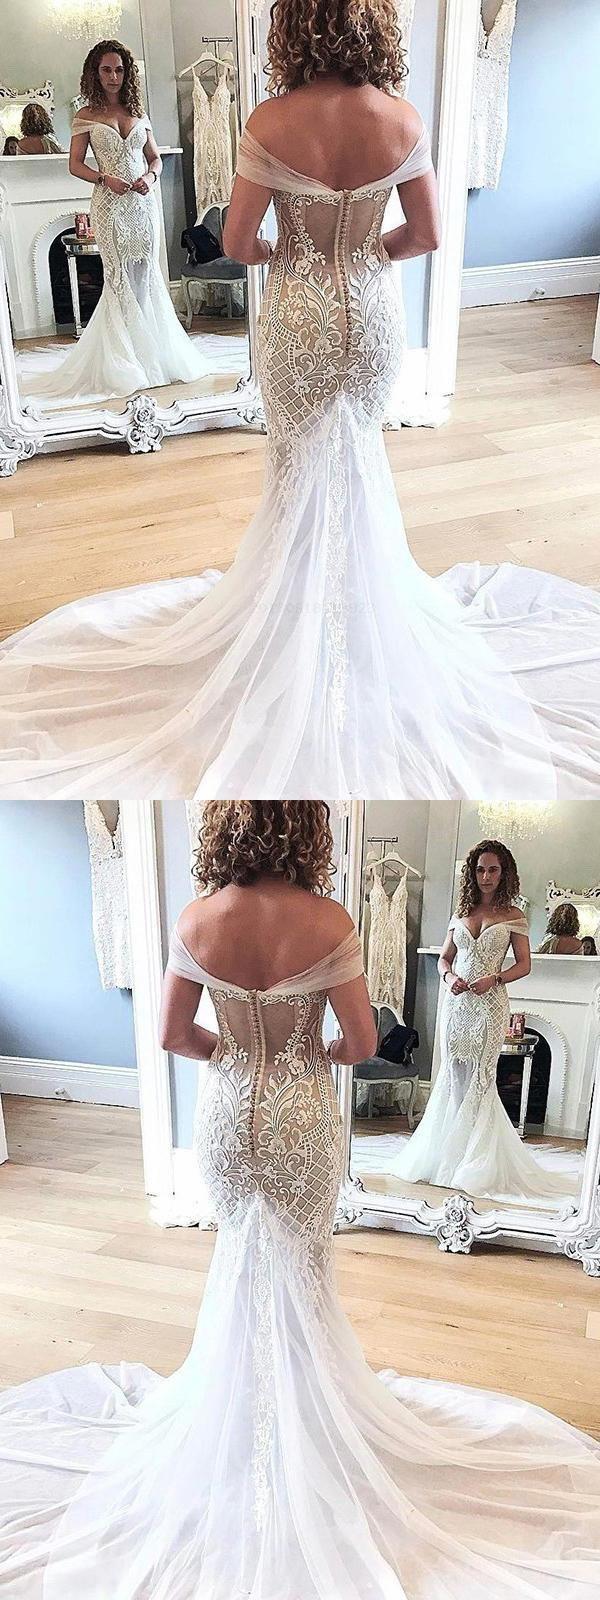 Mermaid Wedding Dress Wedding Dress Lace Custom Wedding Dress Vintage Wedding Dress Custom Mermaid Wedding Dress Wedding Dresses Lace Mermaid Wedding Dress [ 1600 x 600 Pixel ]